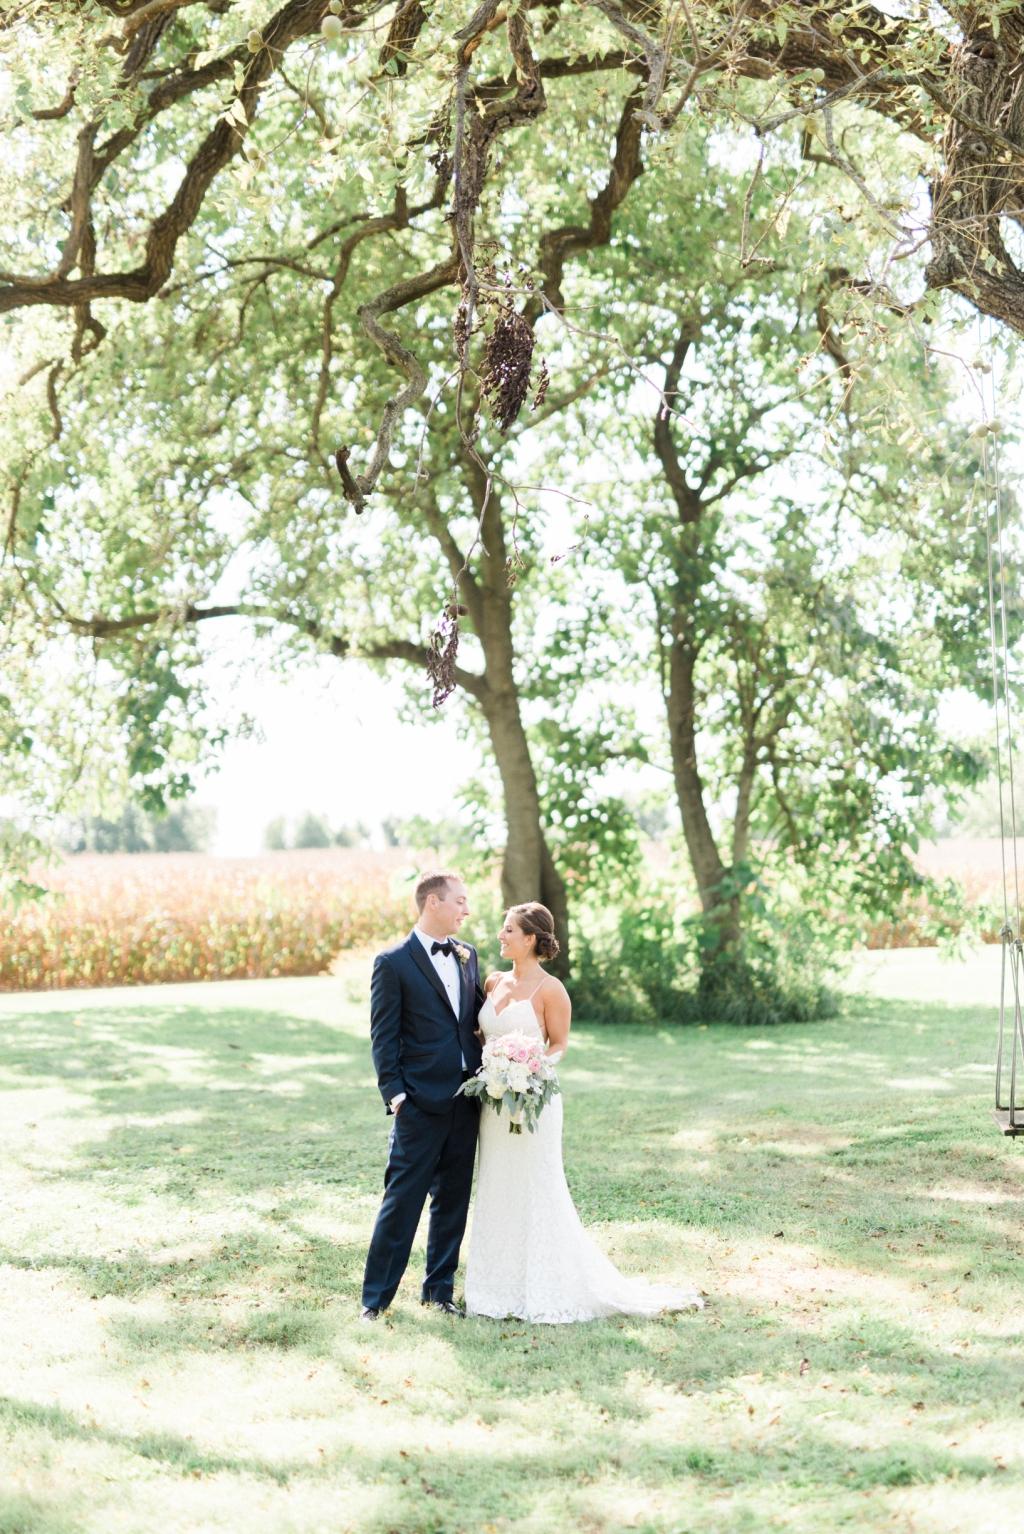 haley-richter-photography-buena-vista-confrence-center-wedding-summer-071